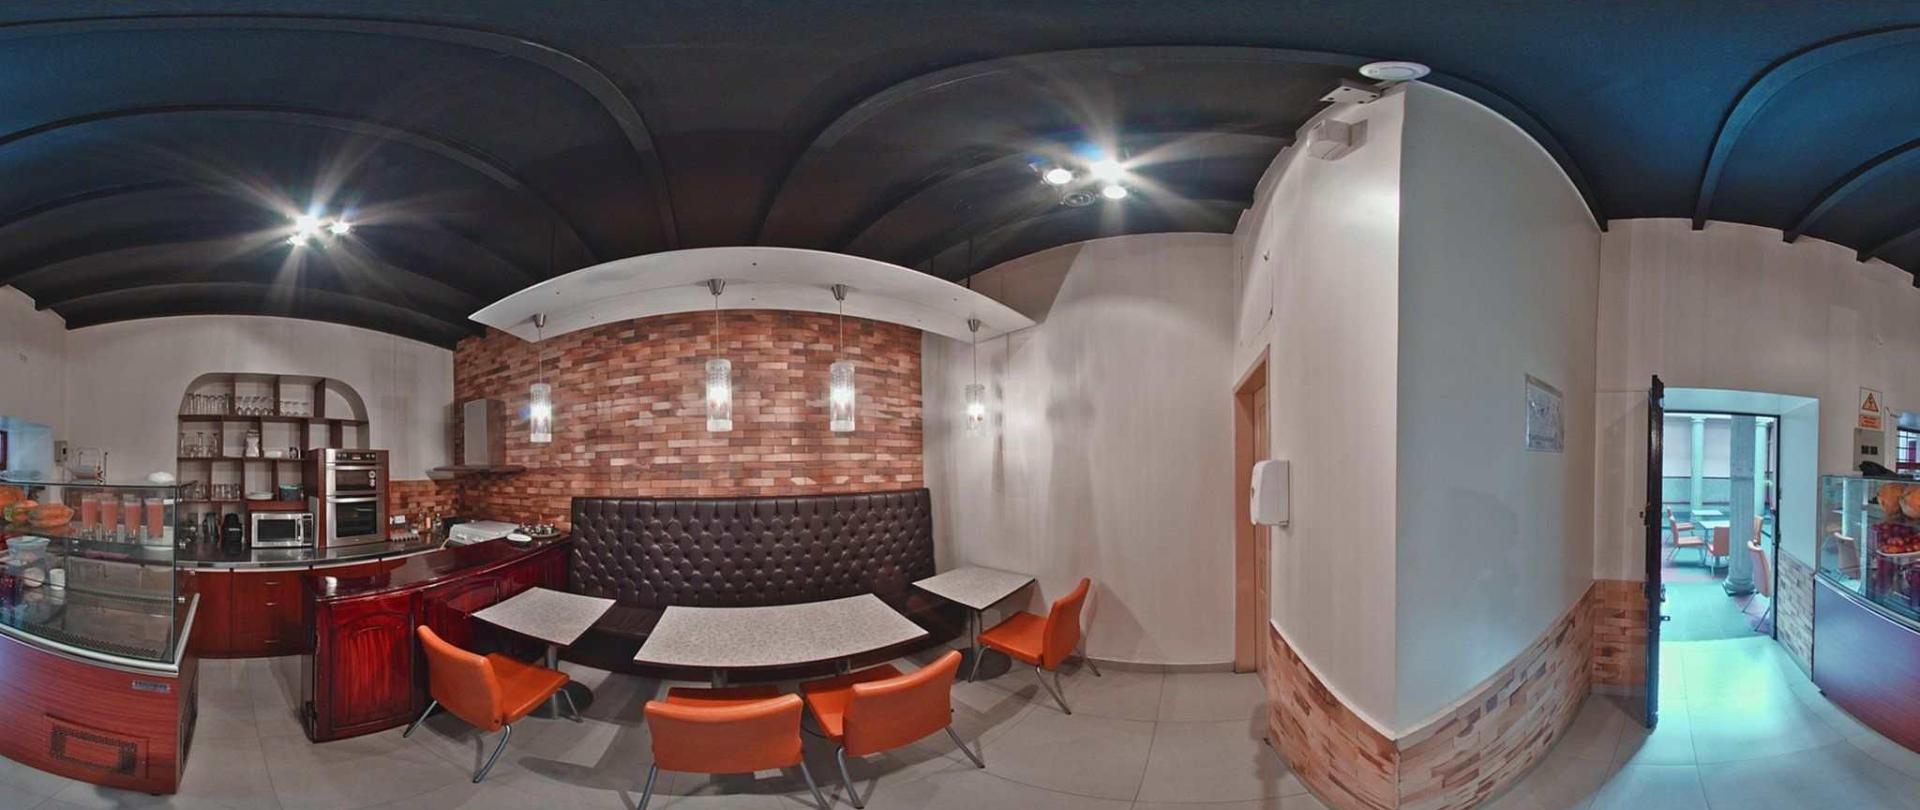 booking-quito-2-rincon-familiar-hostel.jpg